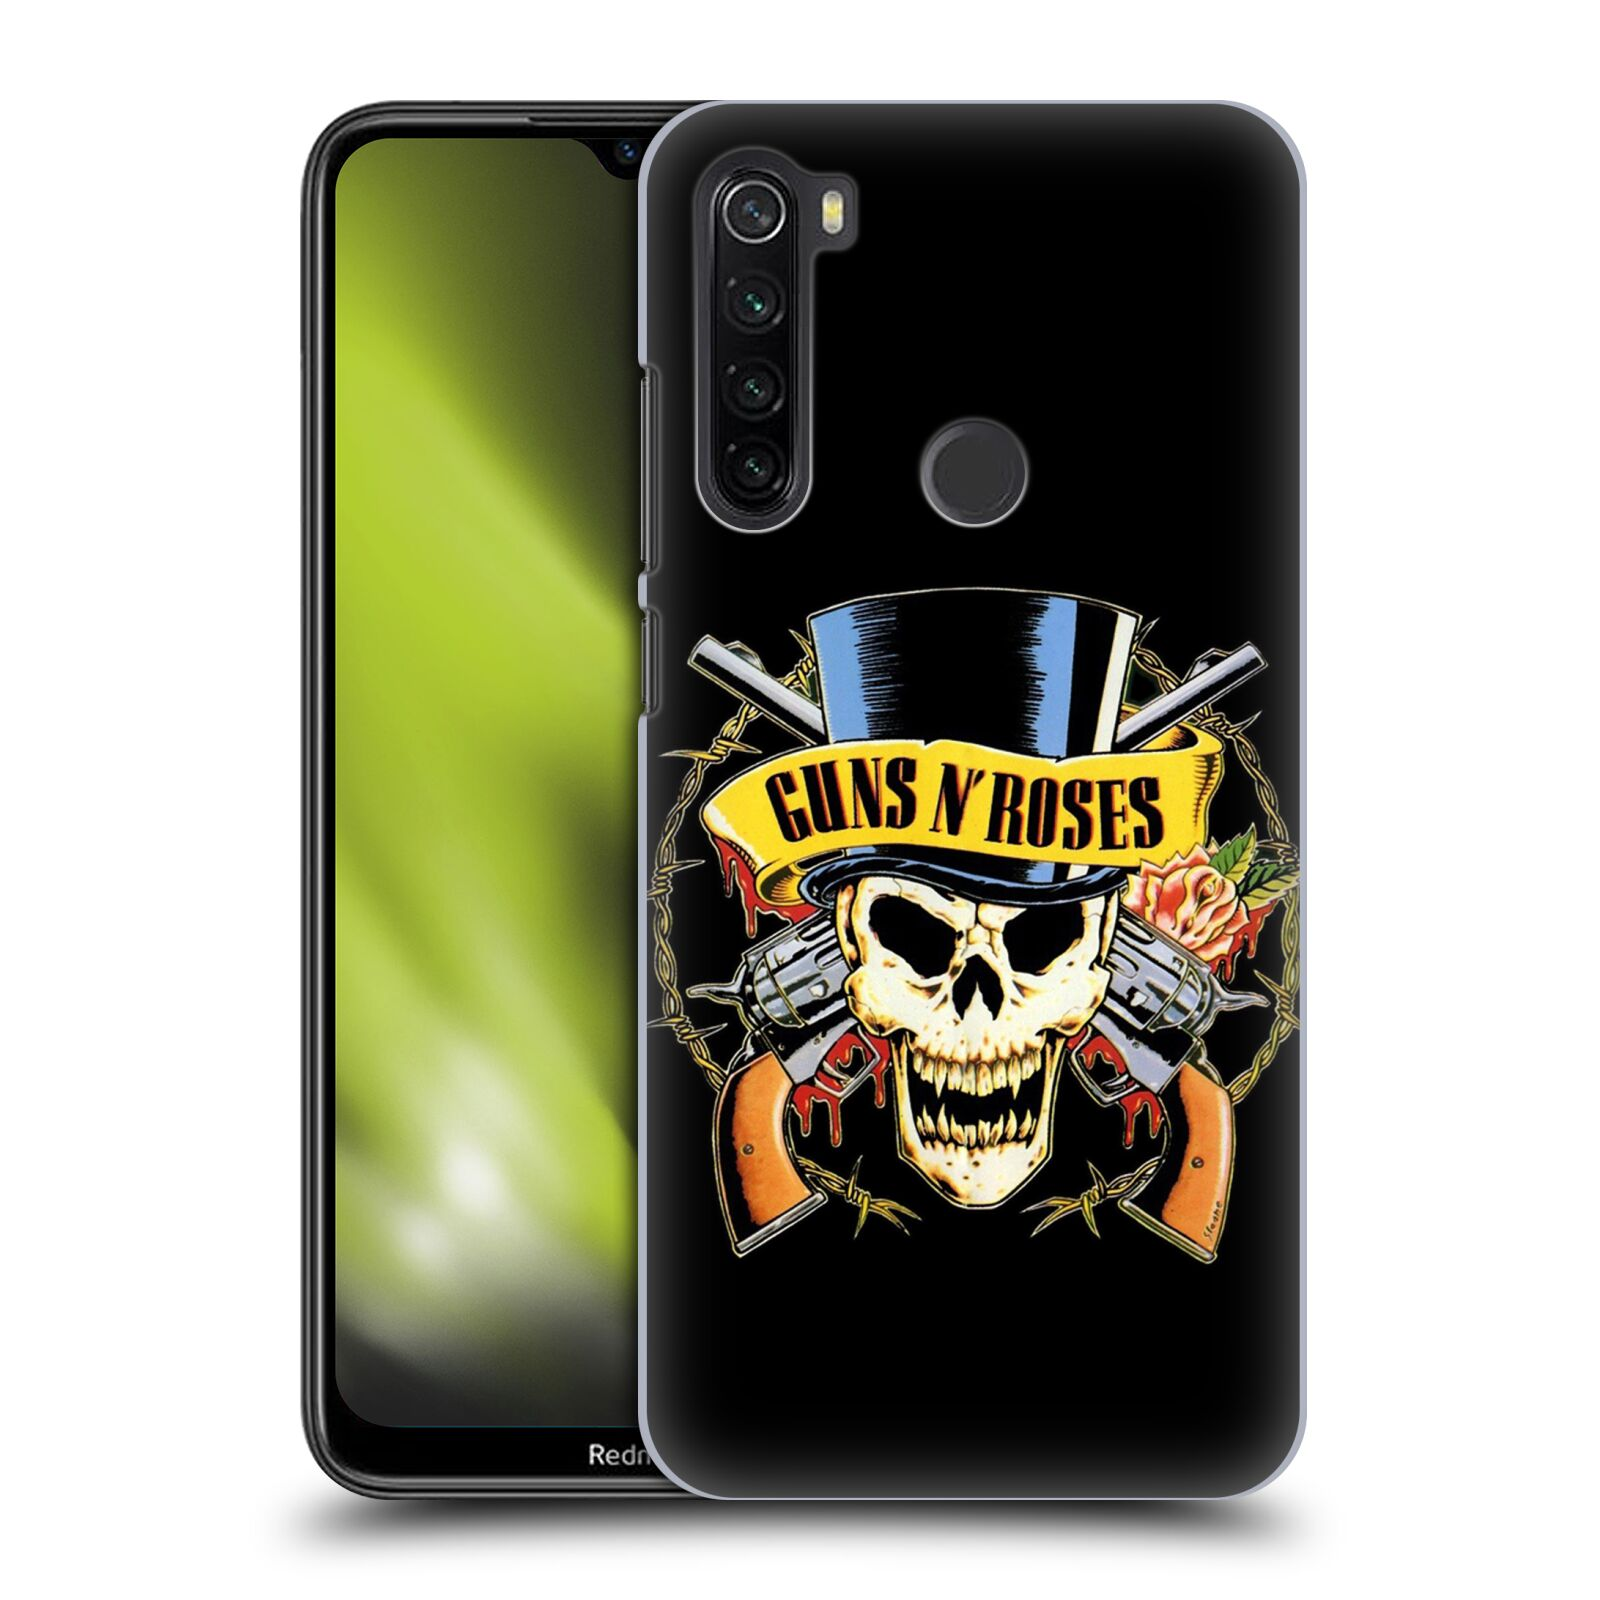 Plastové pouzdro na mobil Xiaomi Redmi Note 8T - Head Case - Guns N' Roses - Lebka